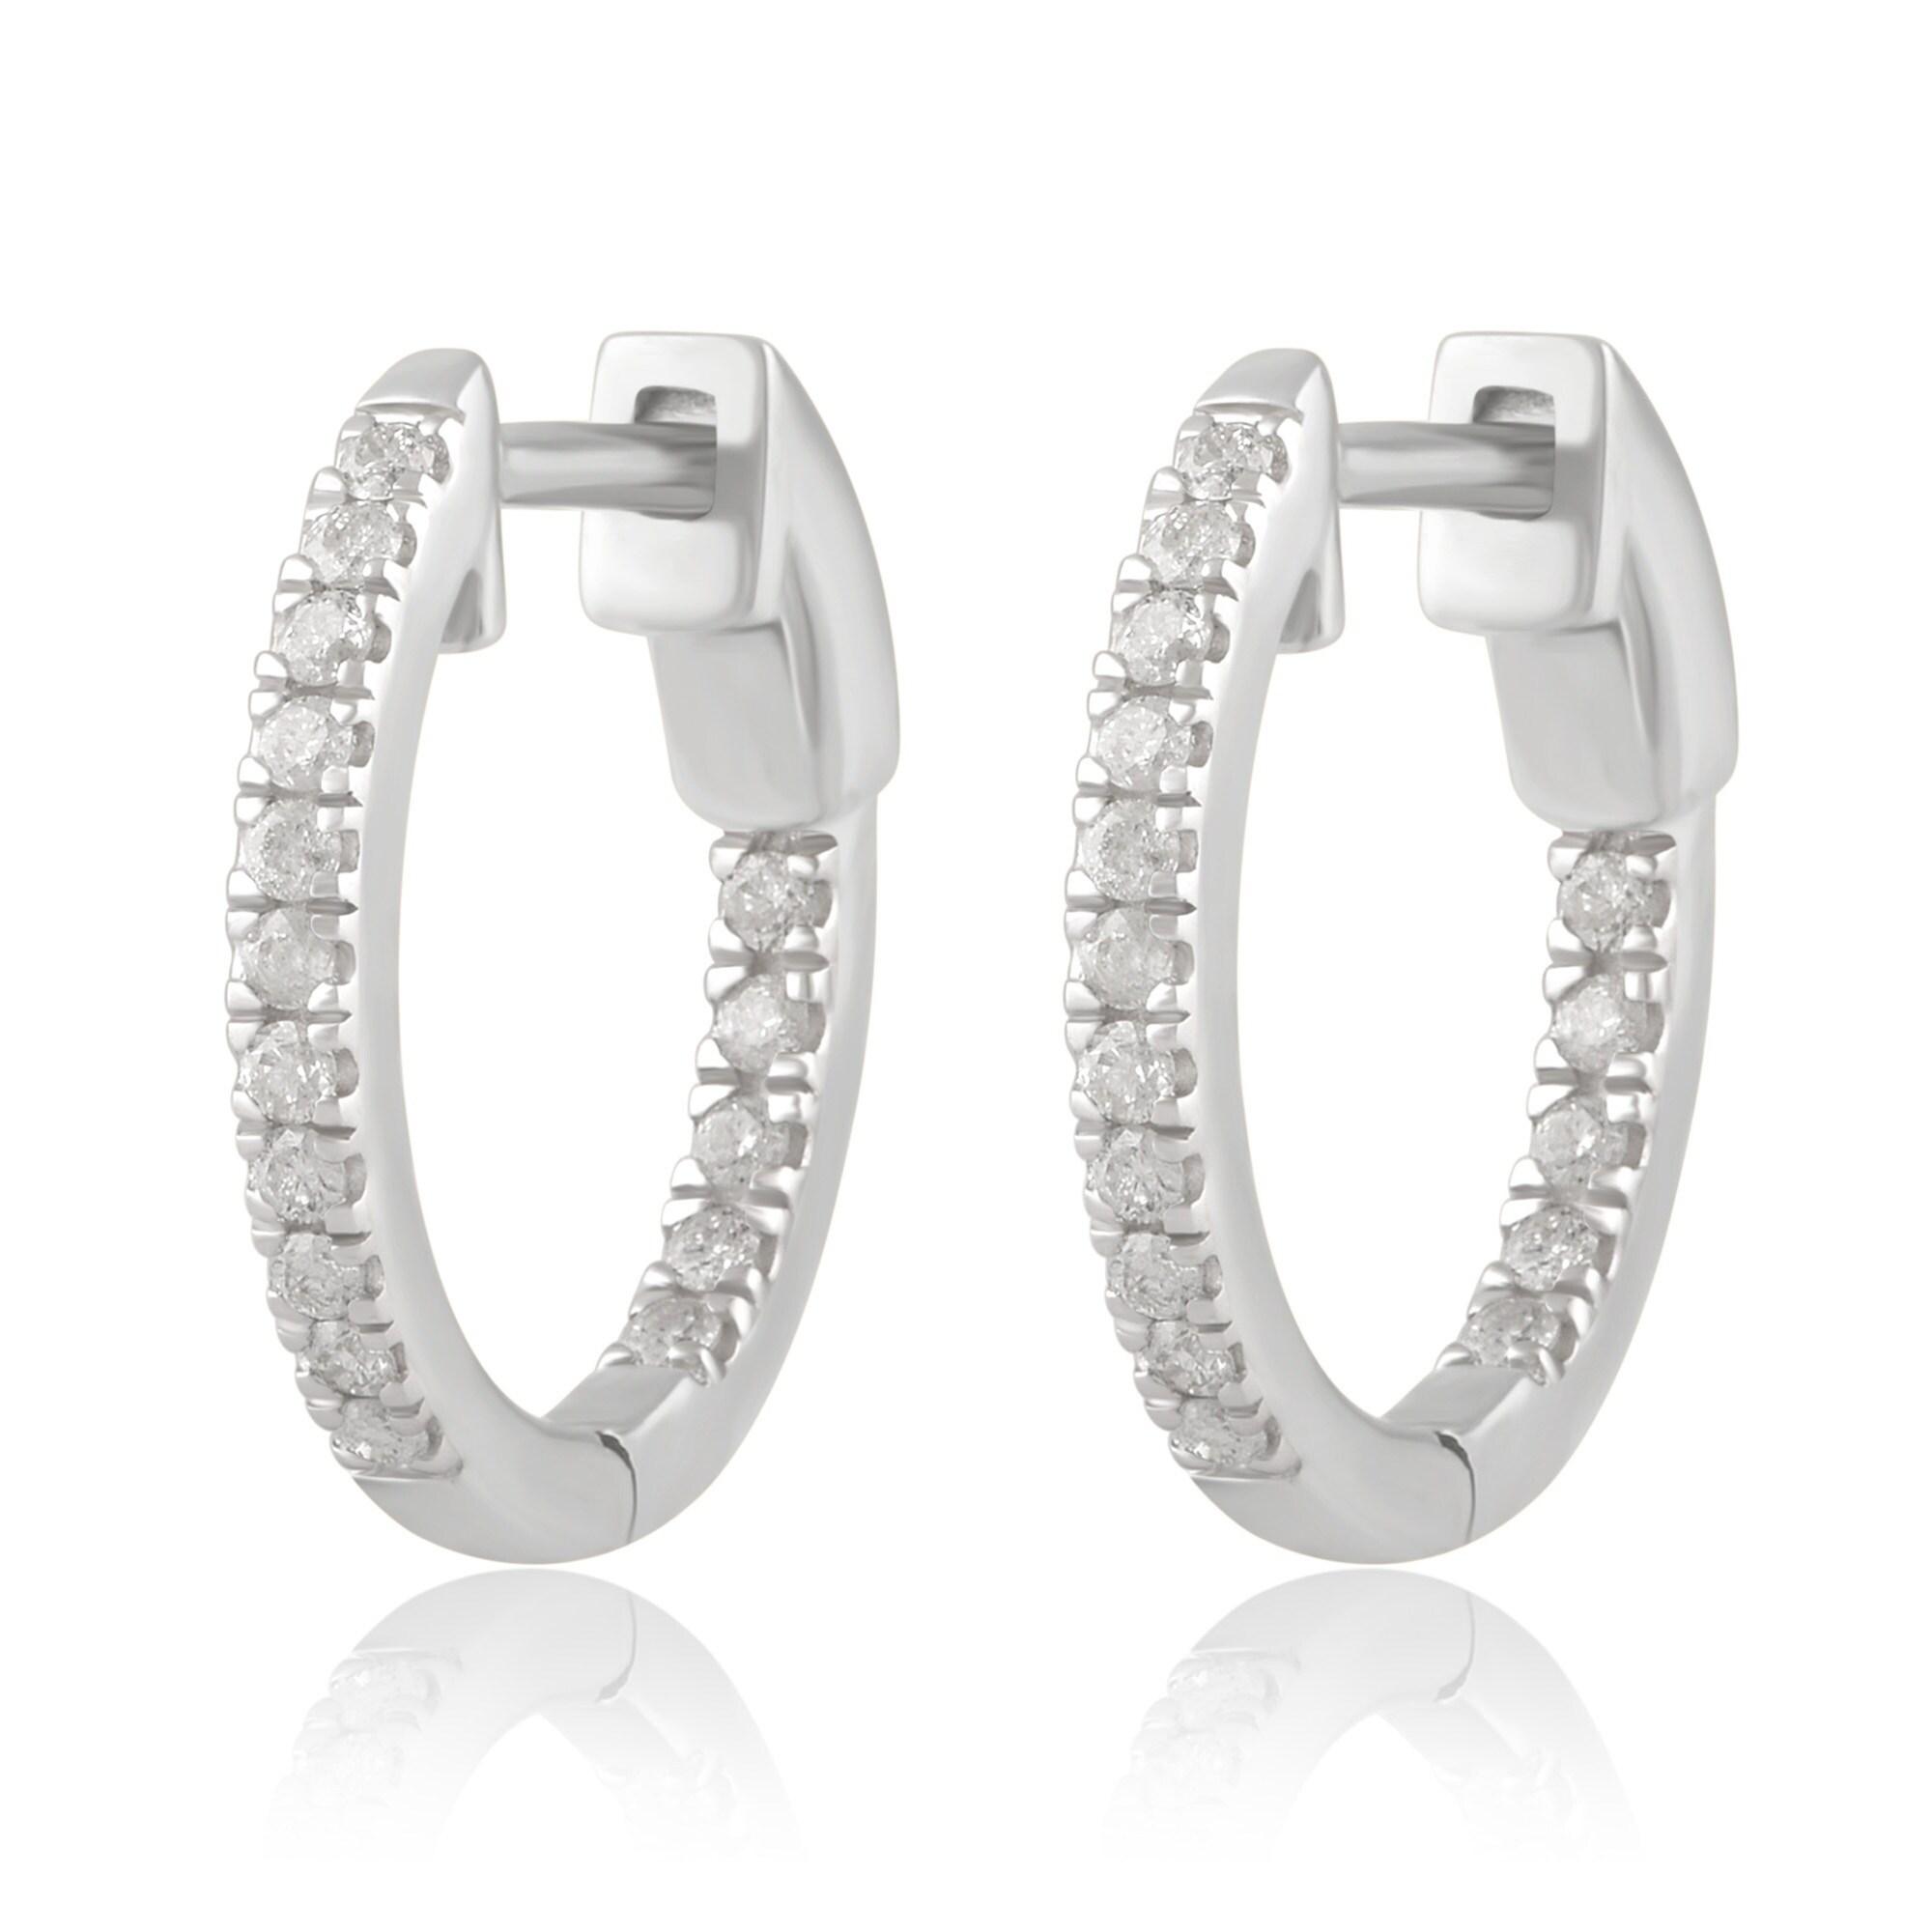 4Ct Round Gorgeous Cut Black Diamond Clip-On Hoop Earrings 14K White Gold Finish